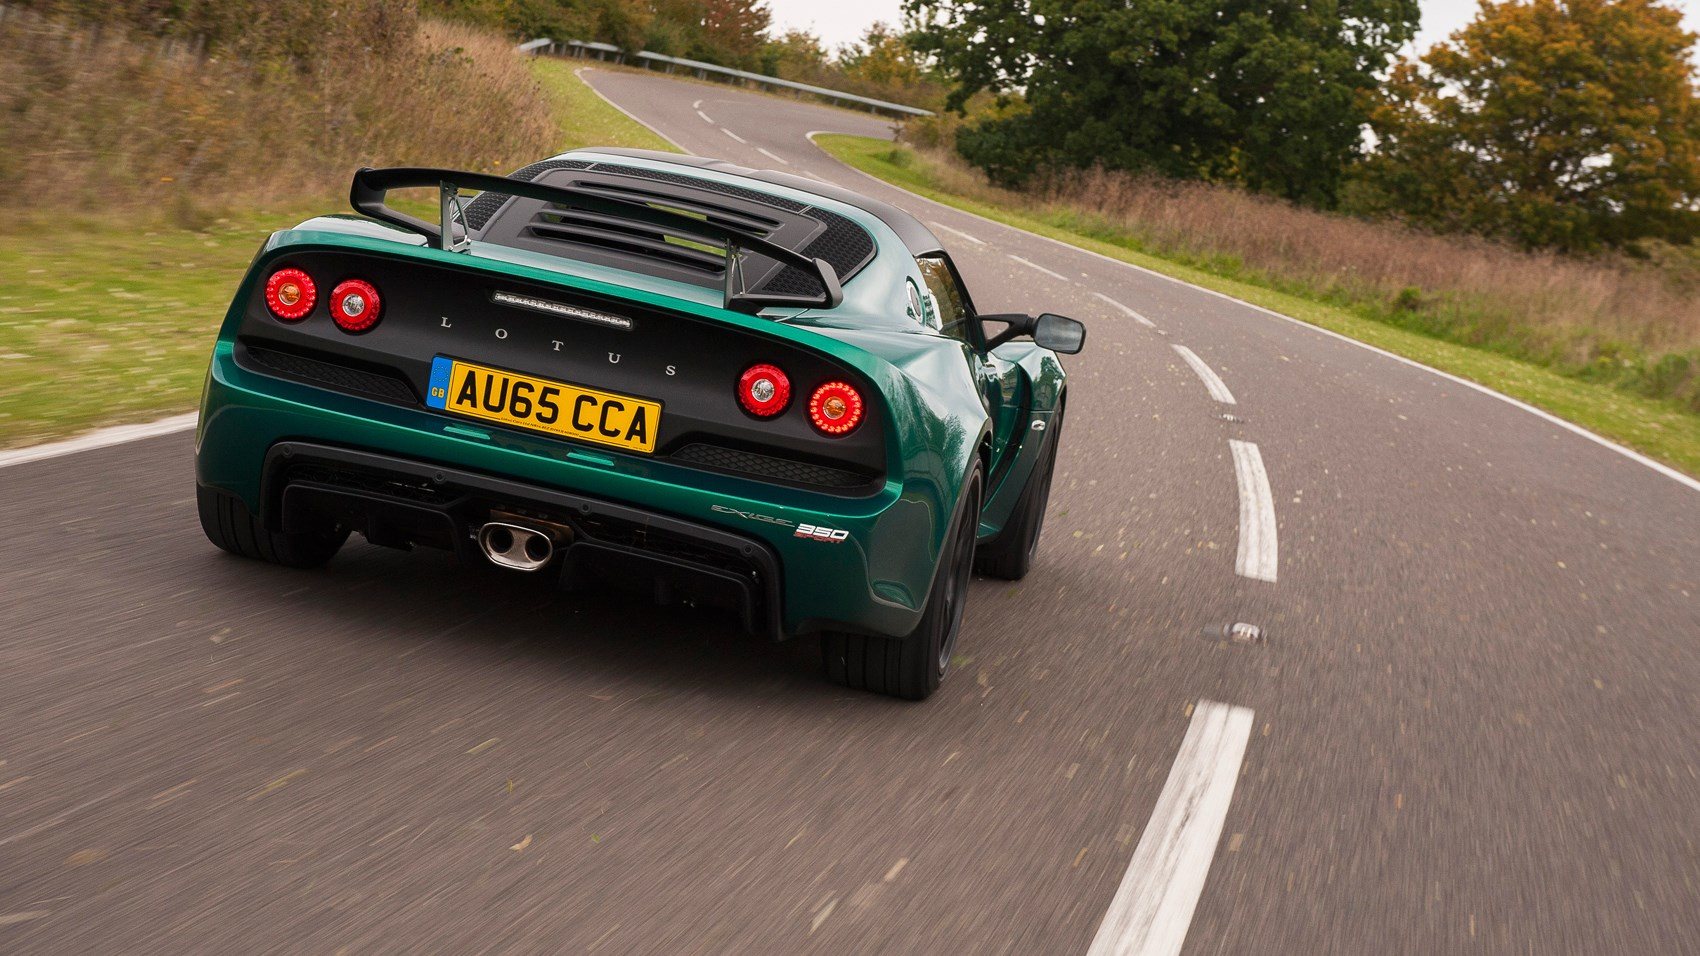 https://www.carmagazine.co.uk/Images/PageFiles/22924/Exige_Sport_350_02.jpg